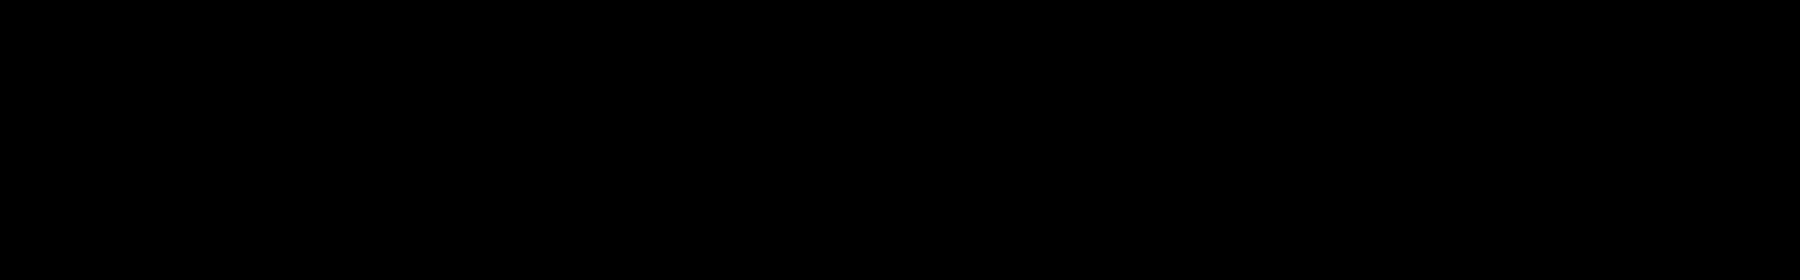 XOXO audio waveform